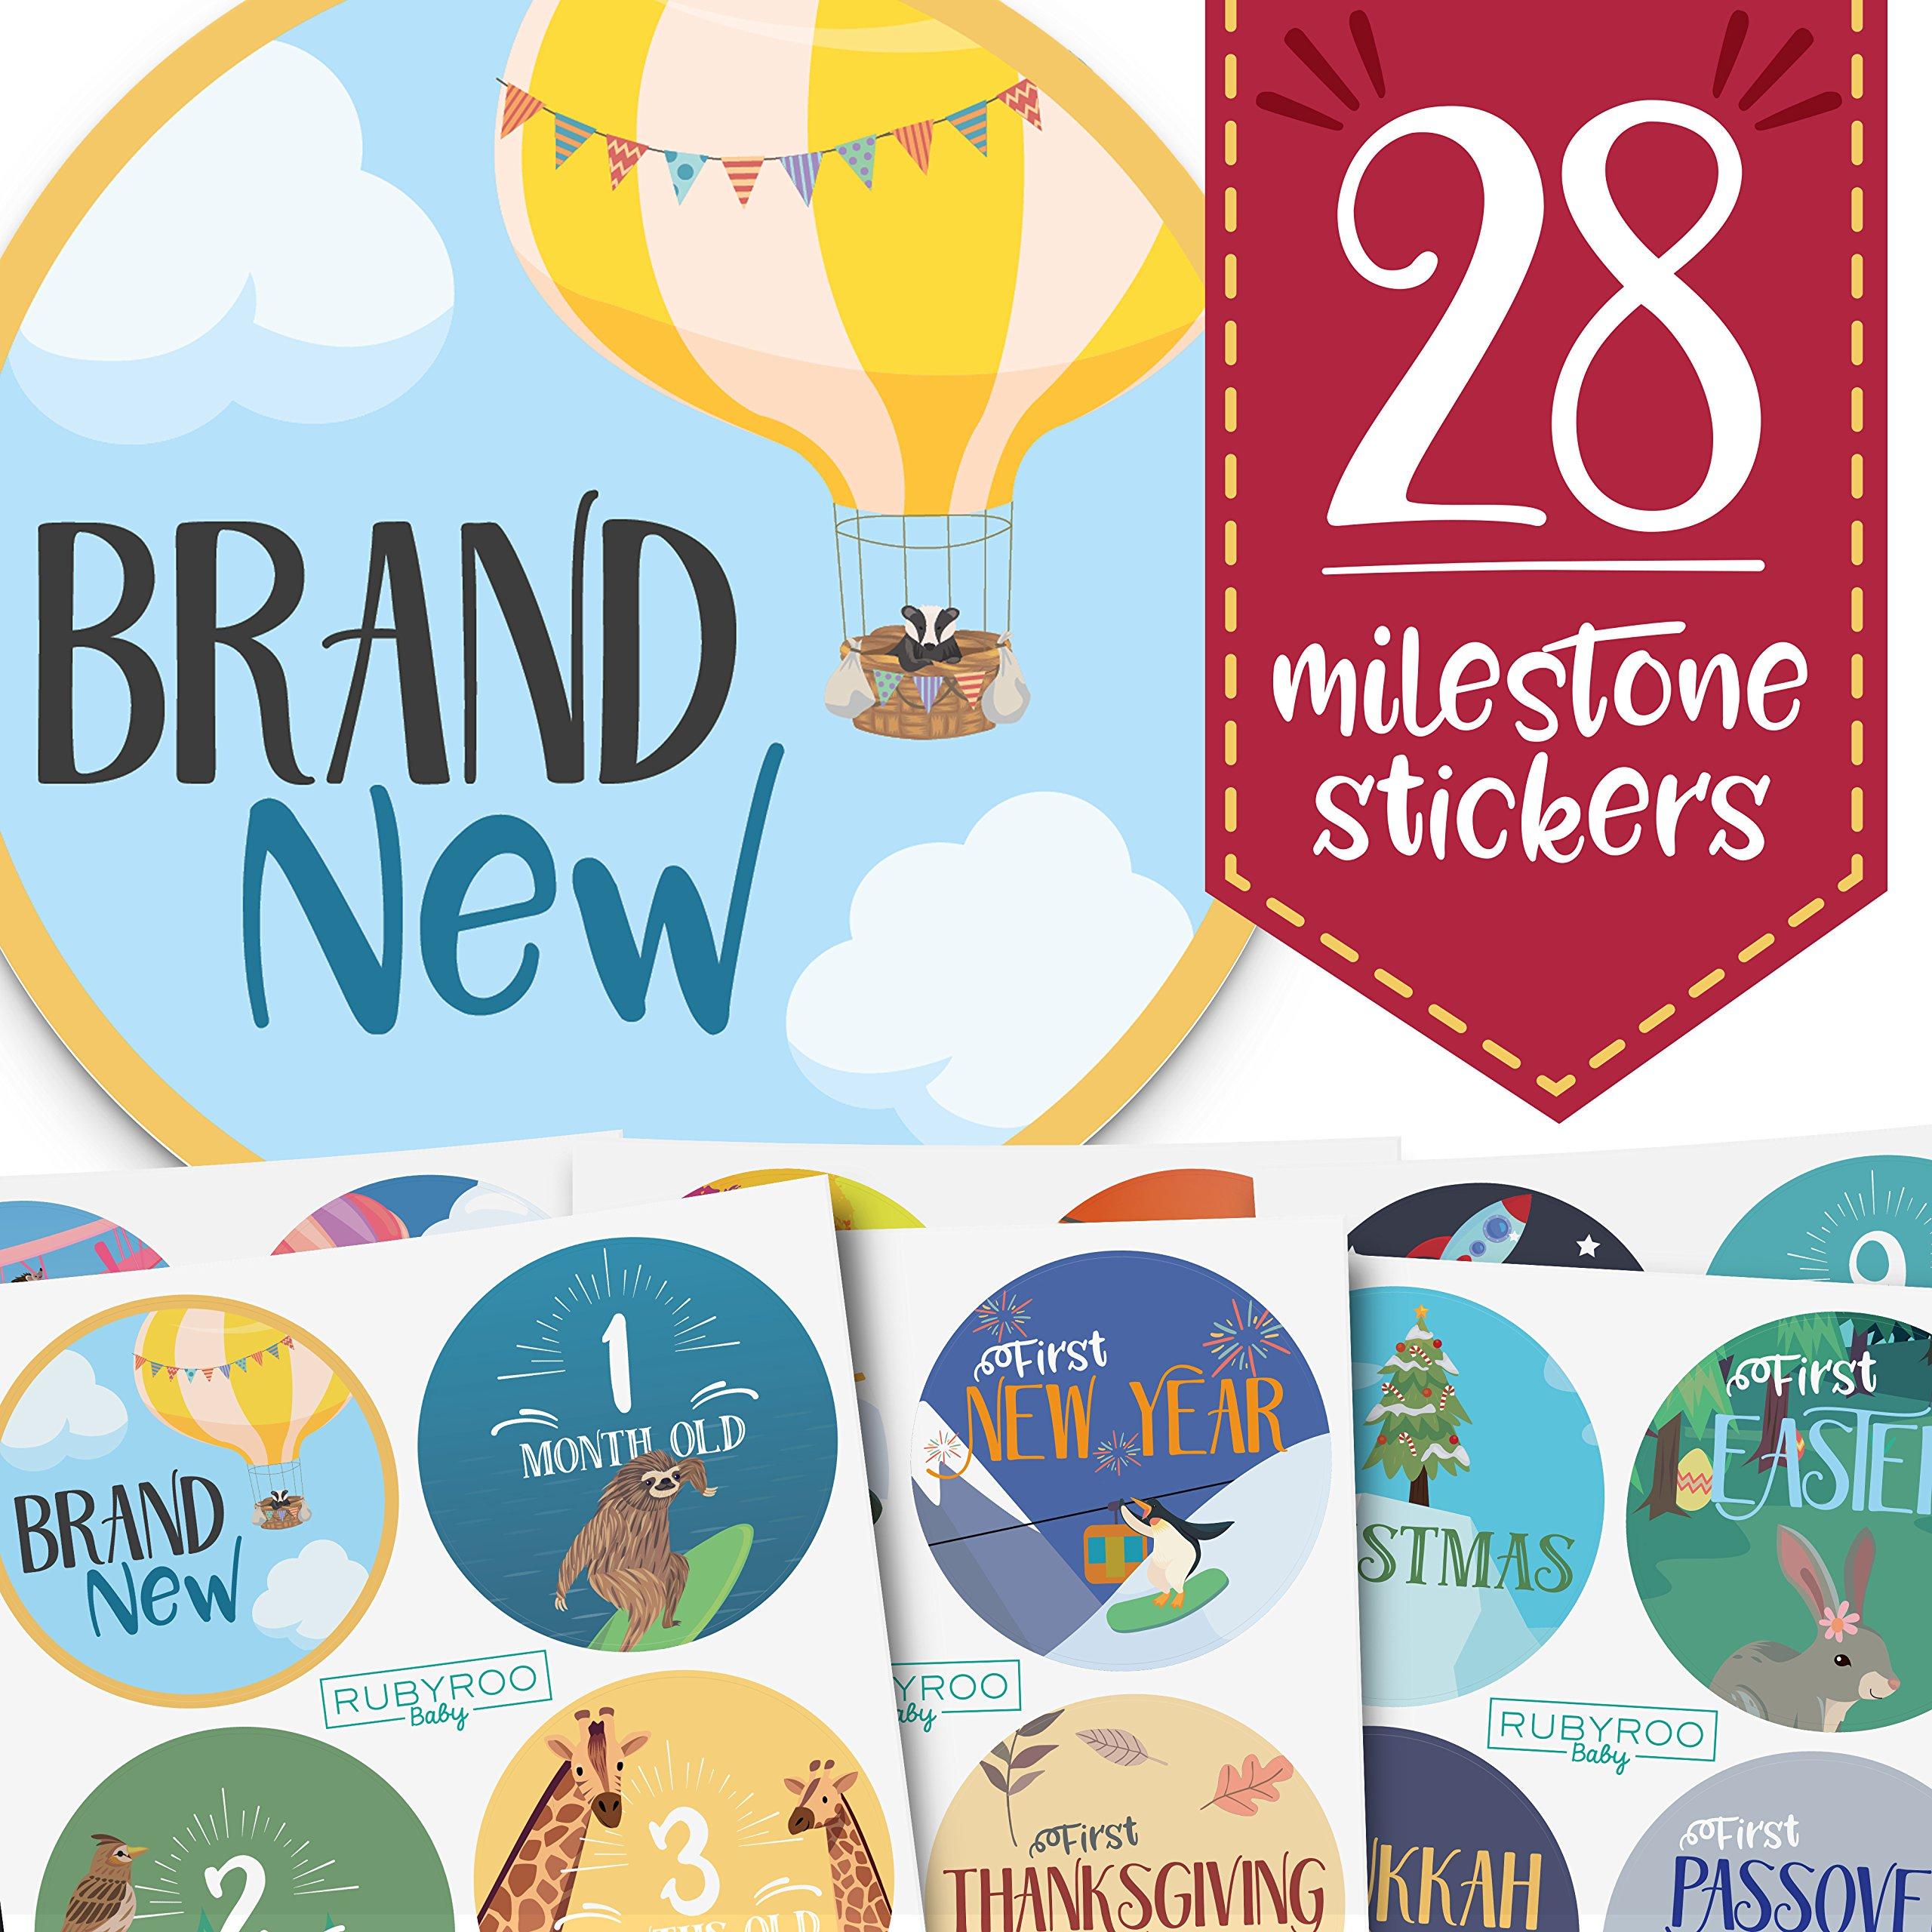 Baby Month & Milestone Stickers - 28 Pack - Baby Boy & Girl Onesie Belly Stickers. Includes 12 monthly, 1st year milestones & first holidays. Perfect baby shower & newborn birthday gift. (Adventure)